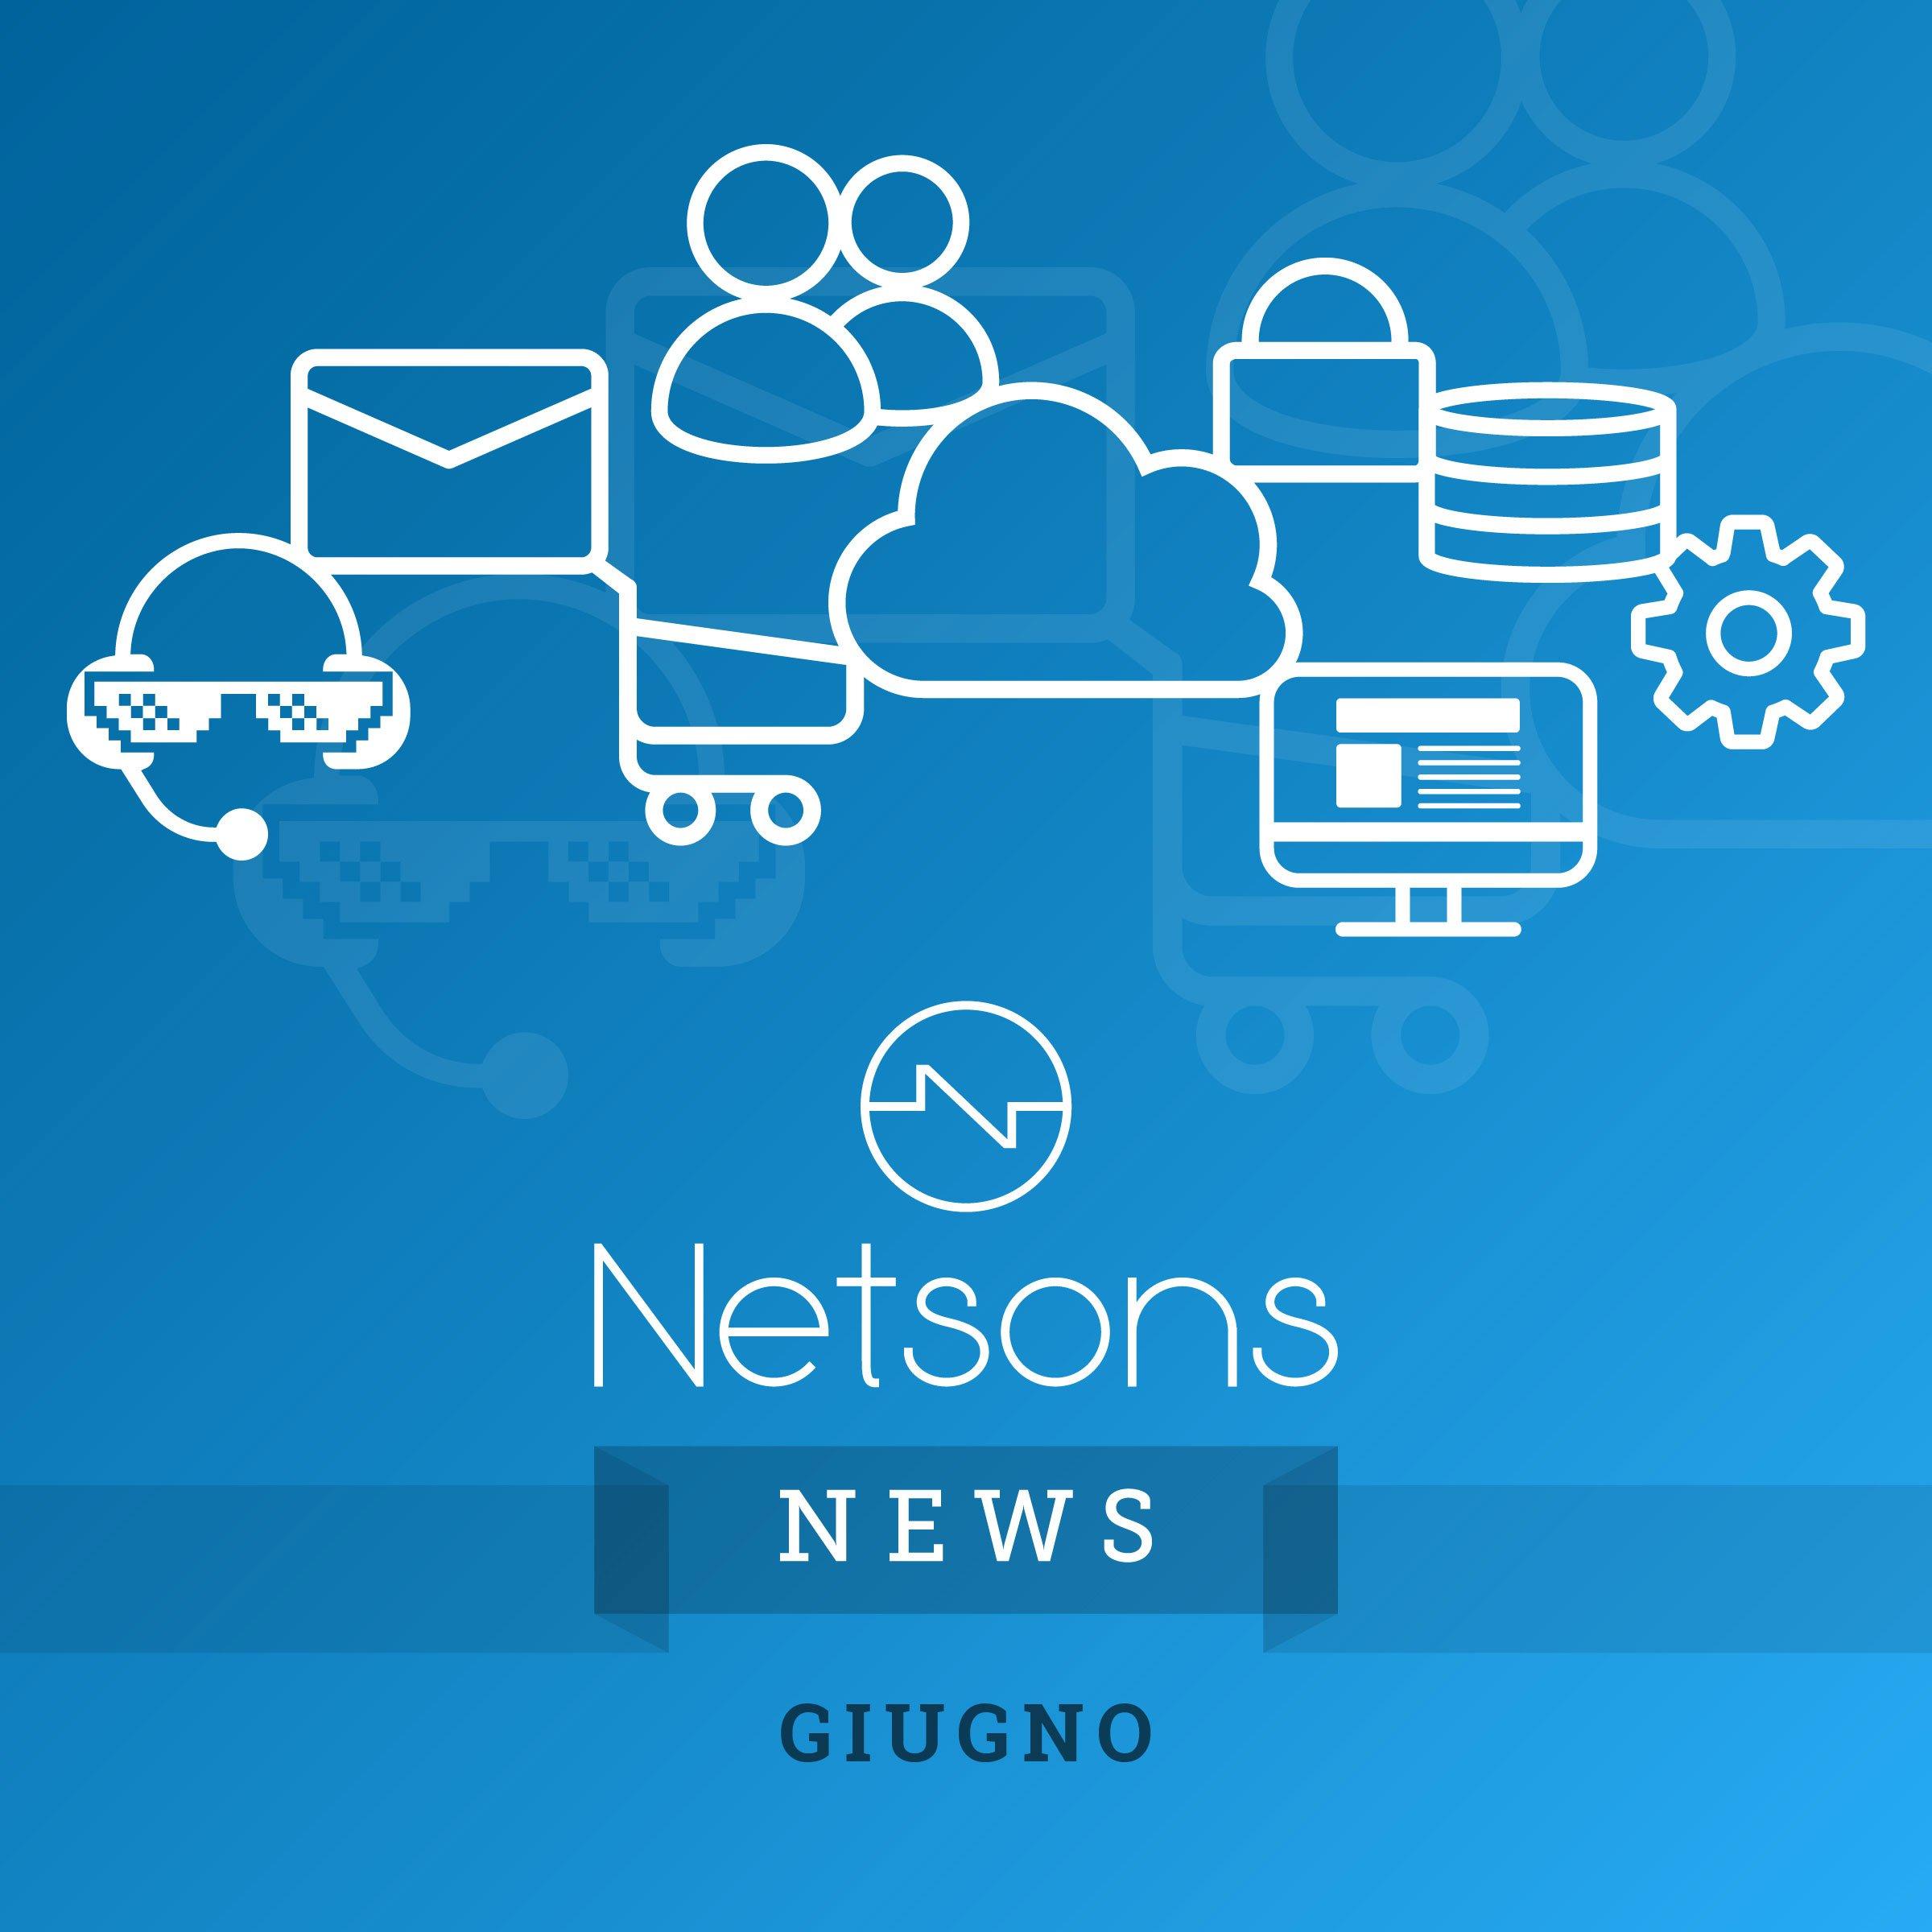 netsons news giugno